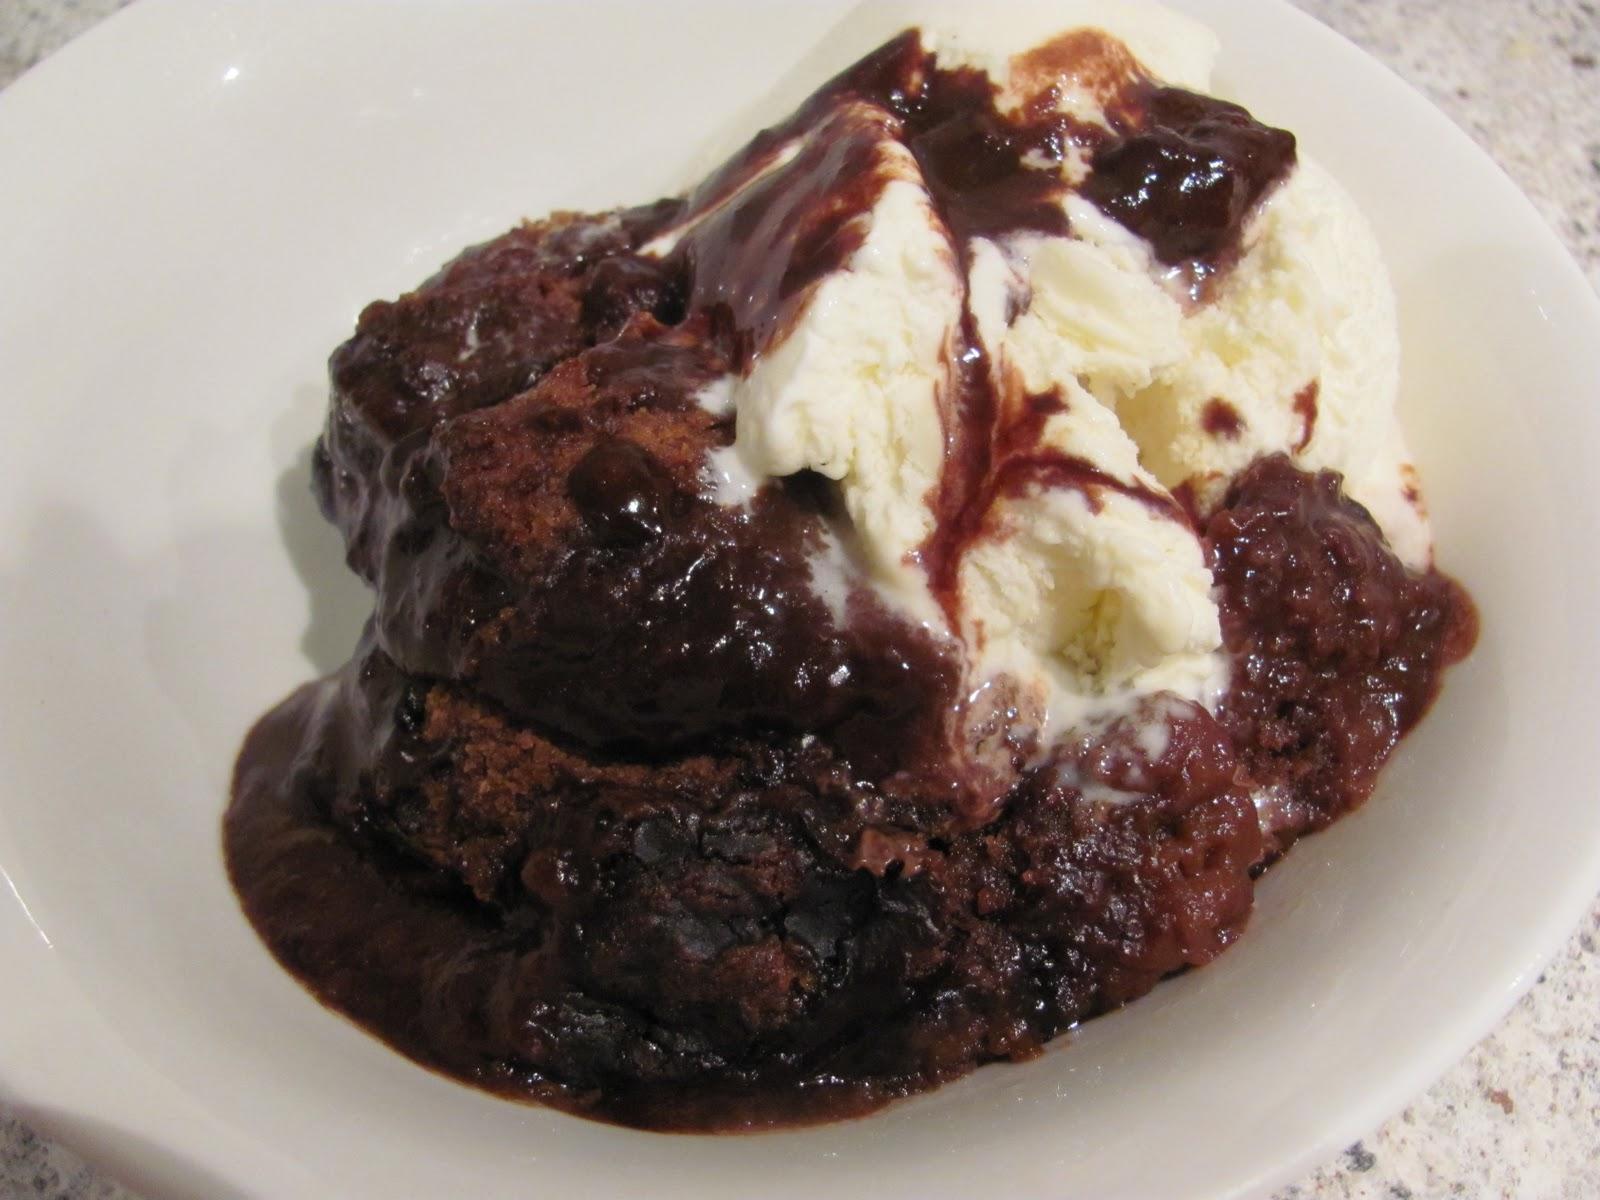 Edmonds Chocolate Self Saucing Pudding Microwave